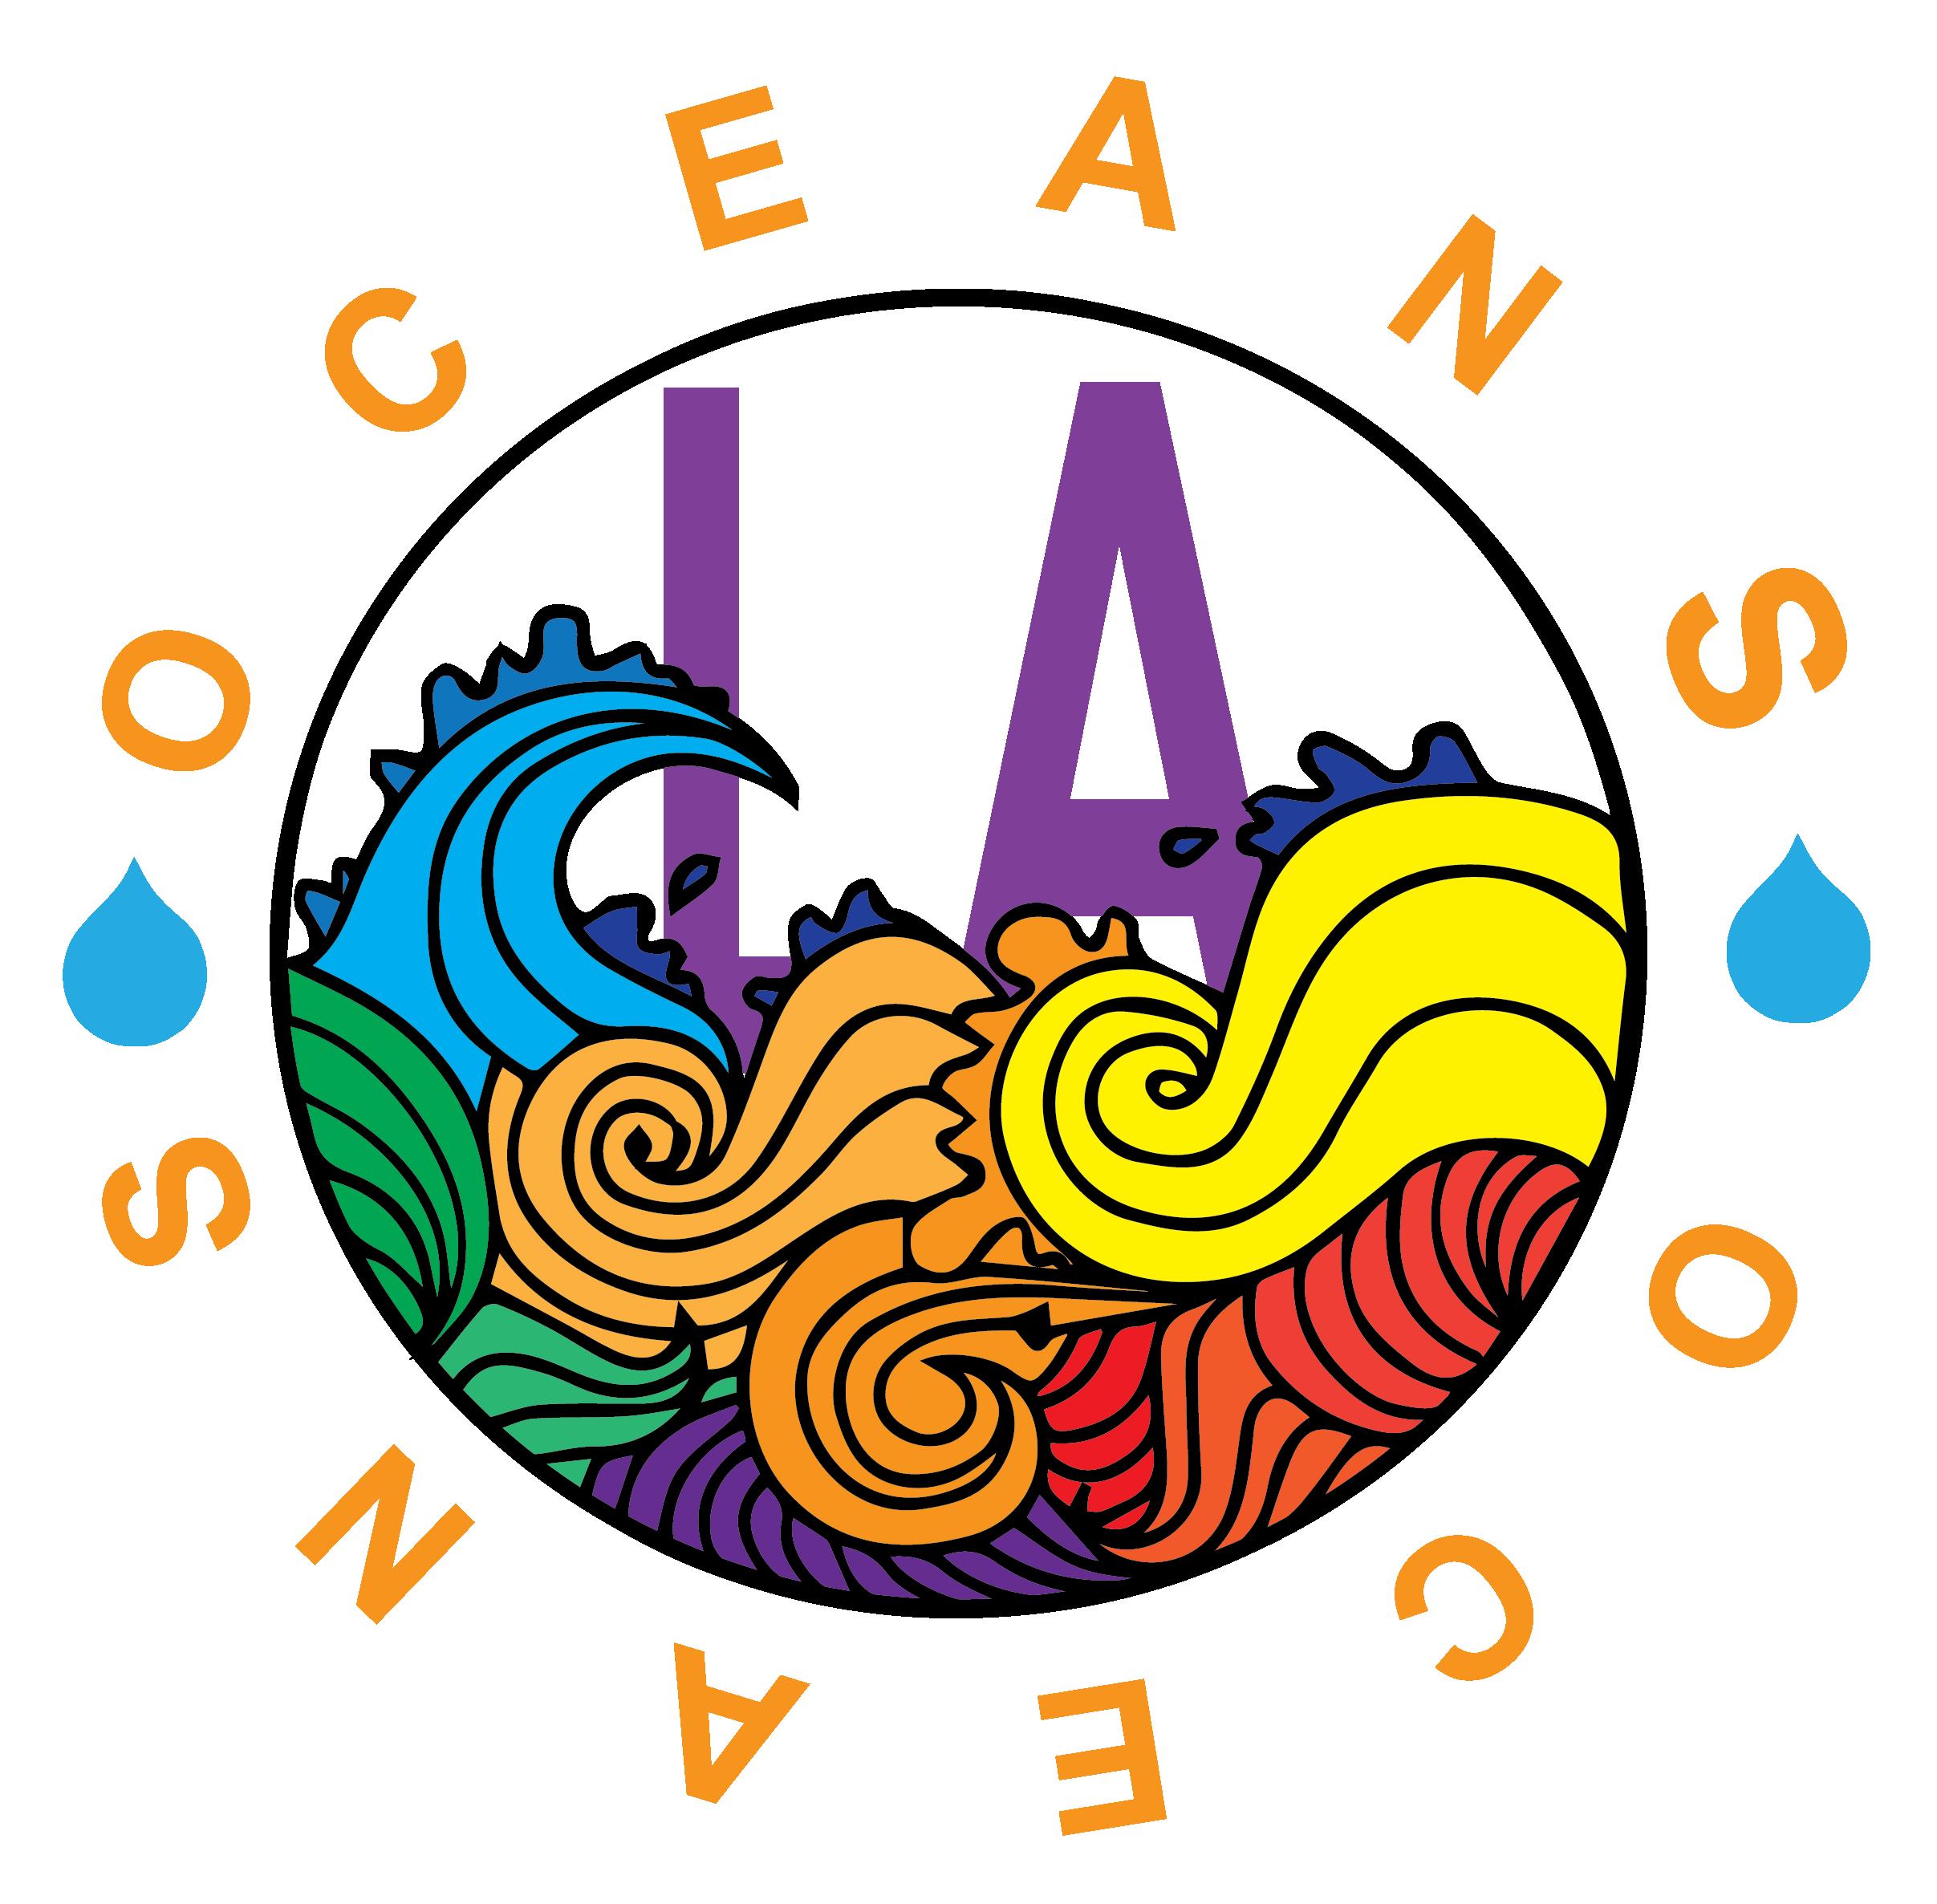 oceans logo copy.png